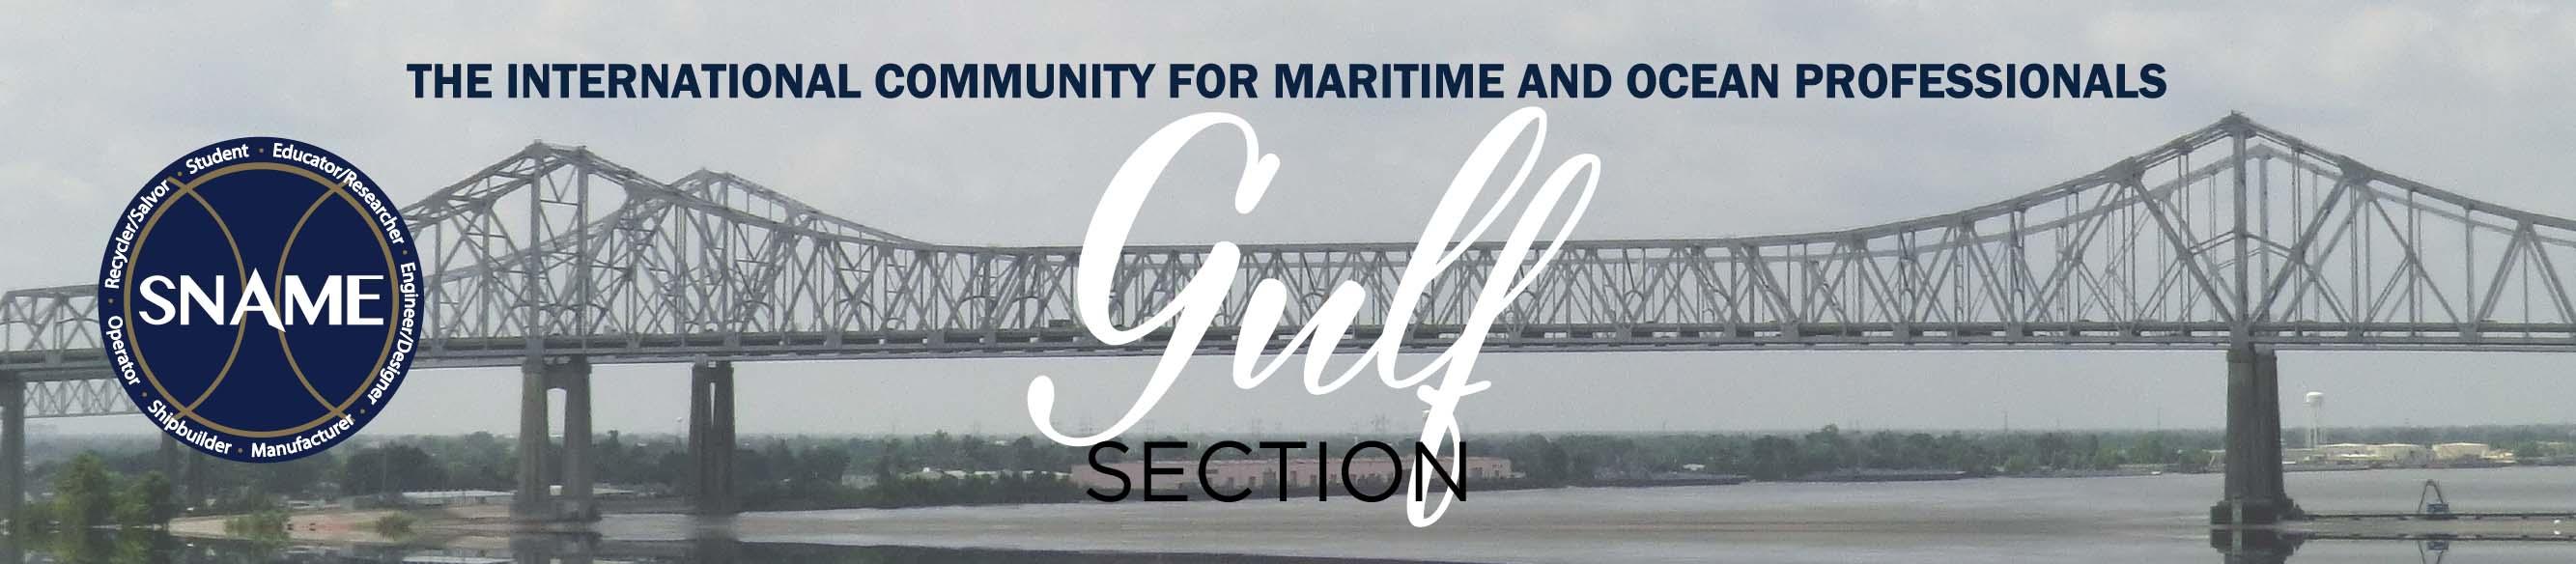 GulfSection